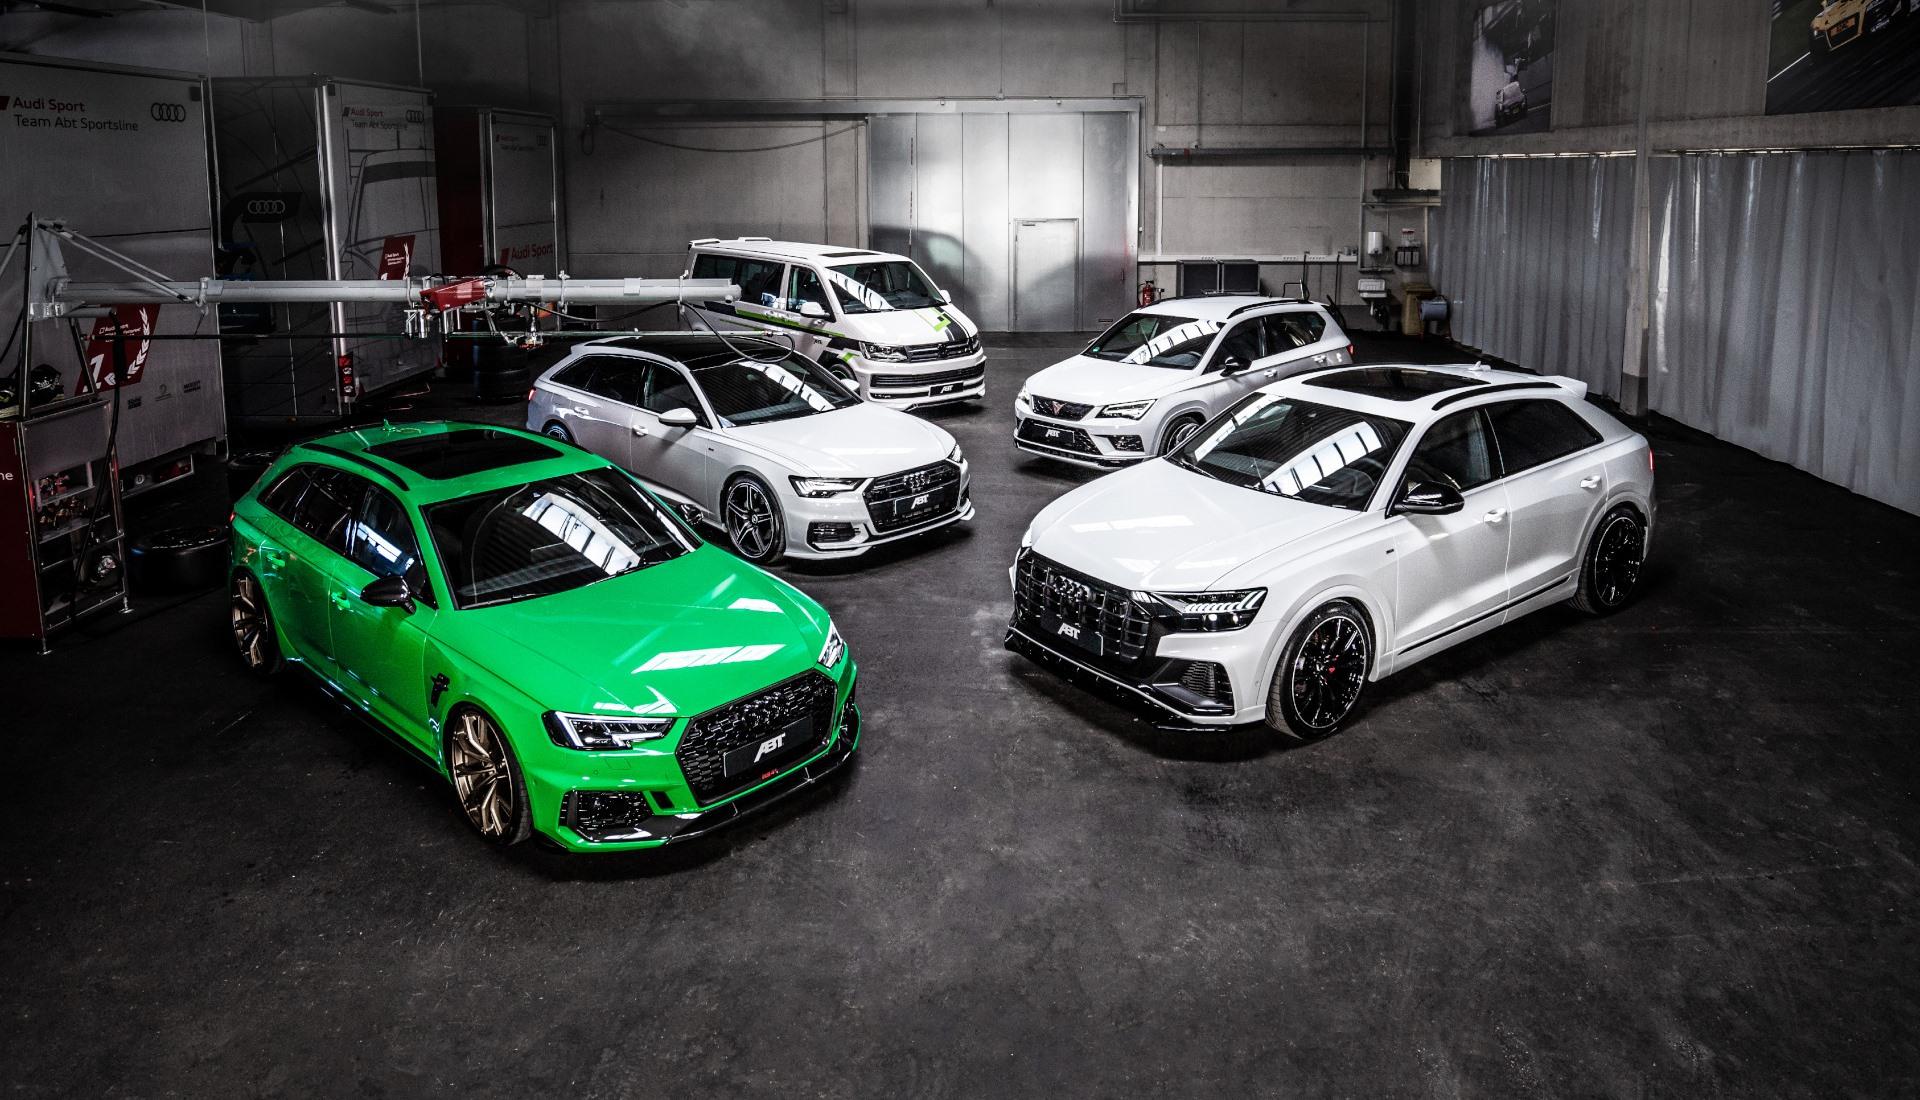 Audi Tuning, VW Tuning, Chiptuning von ABT Sportsline.